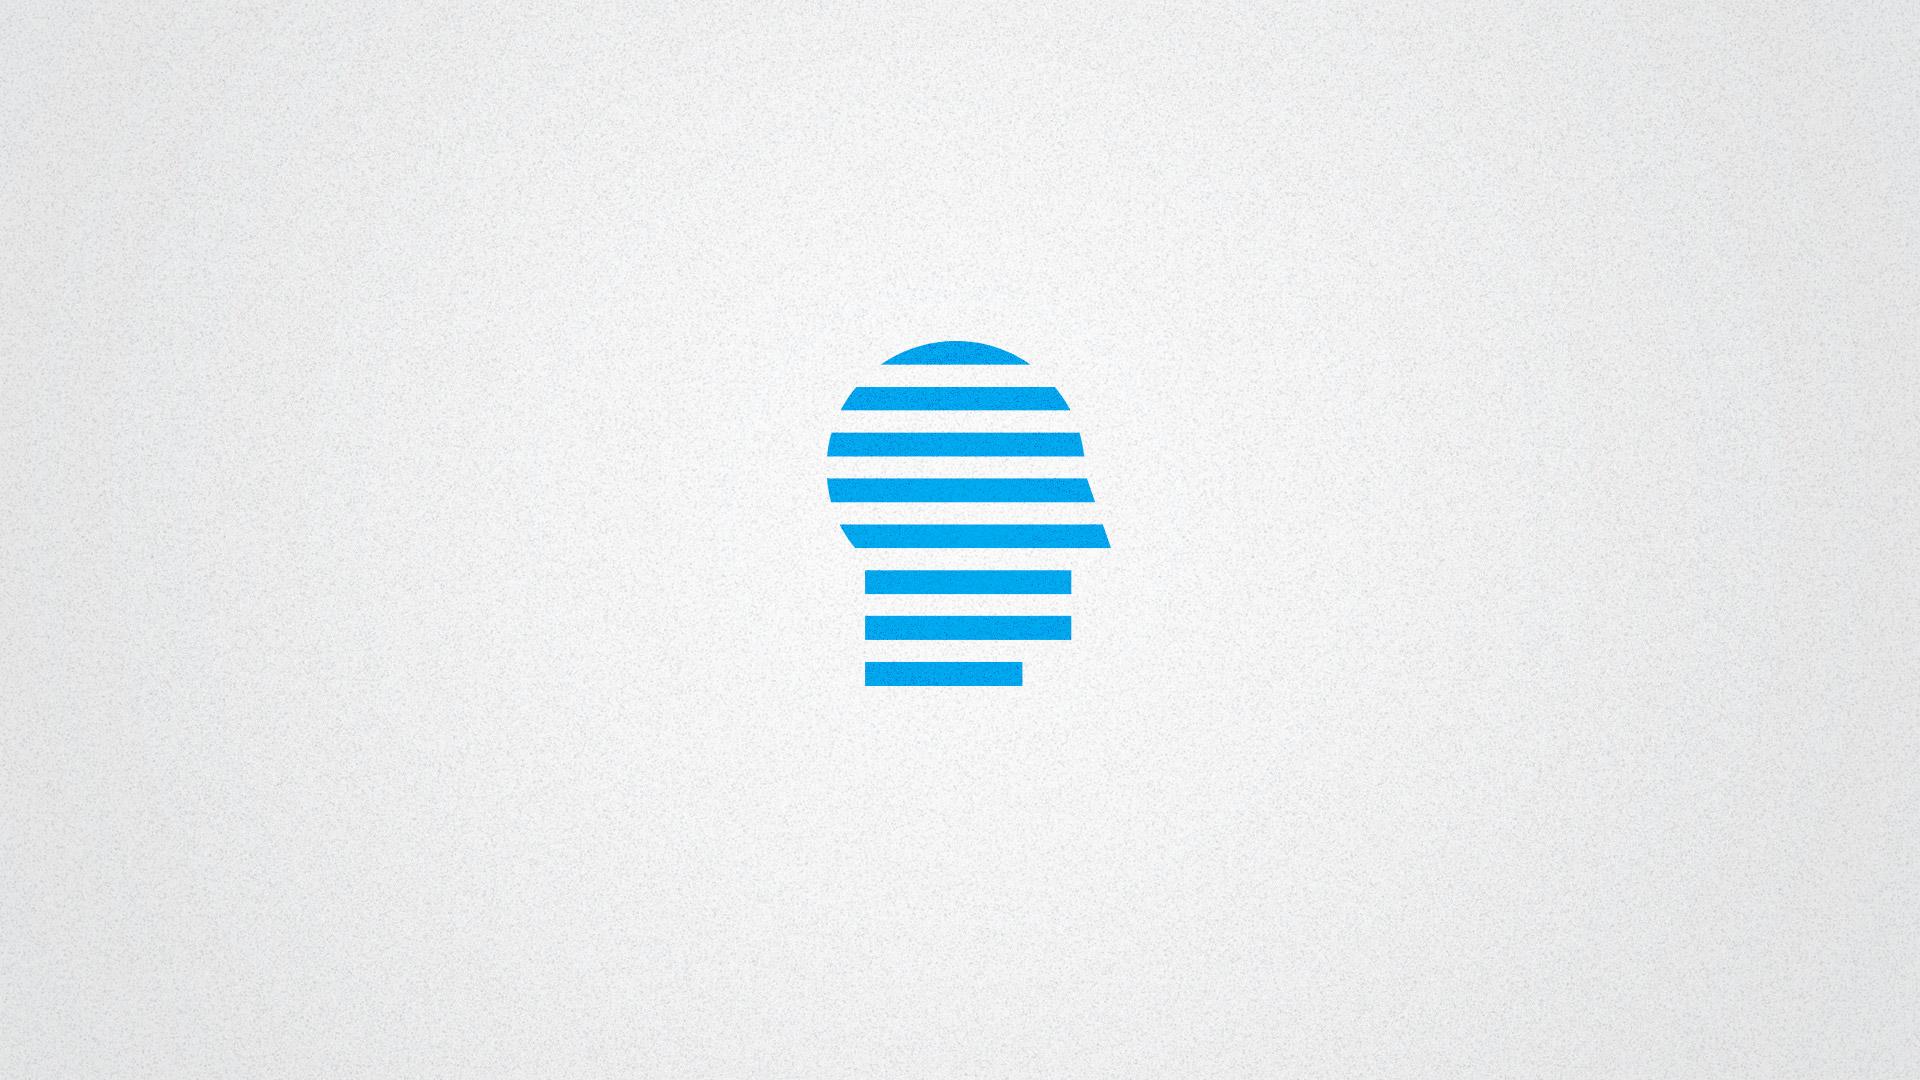 FRAME-19-IBM-JerryNelson